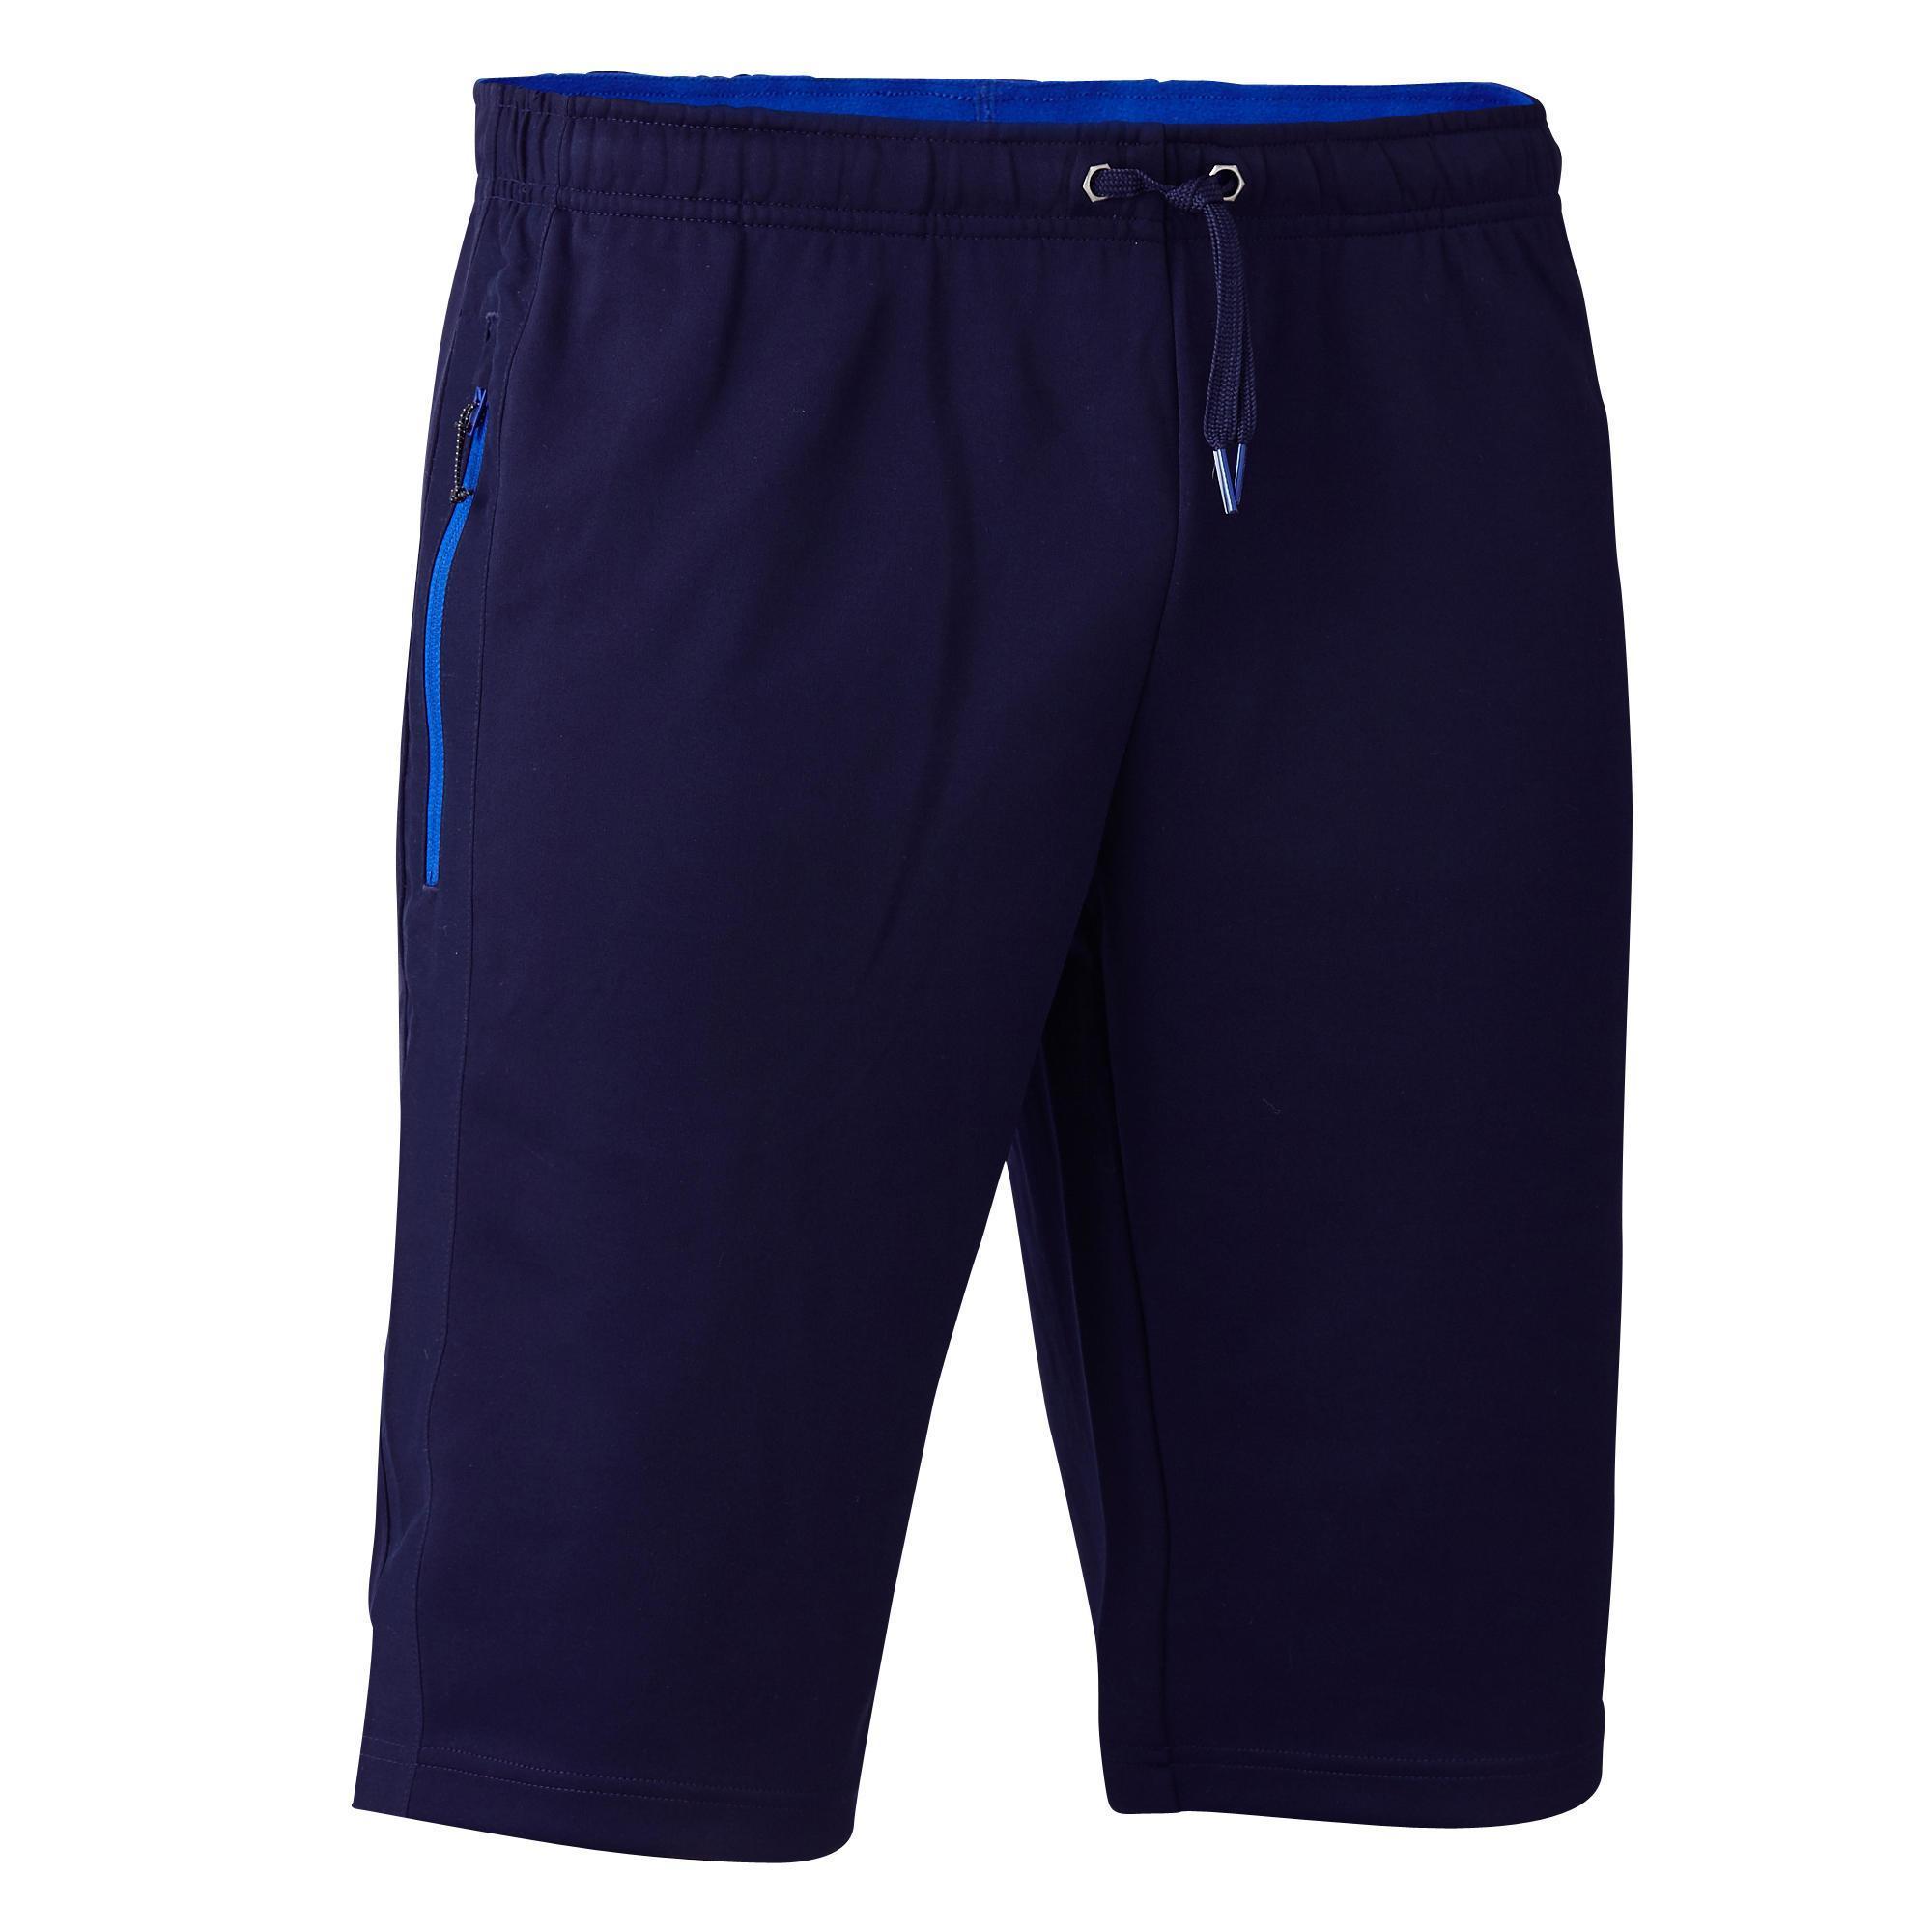 Kipsta Voetbalbroekje T500 marineblauw